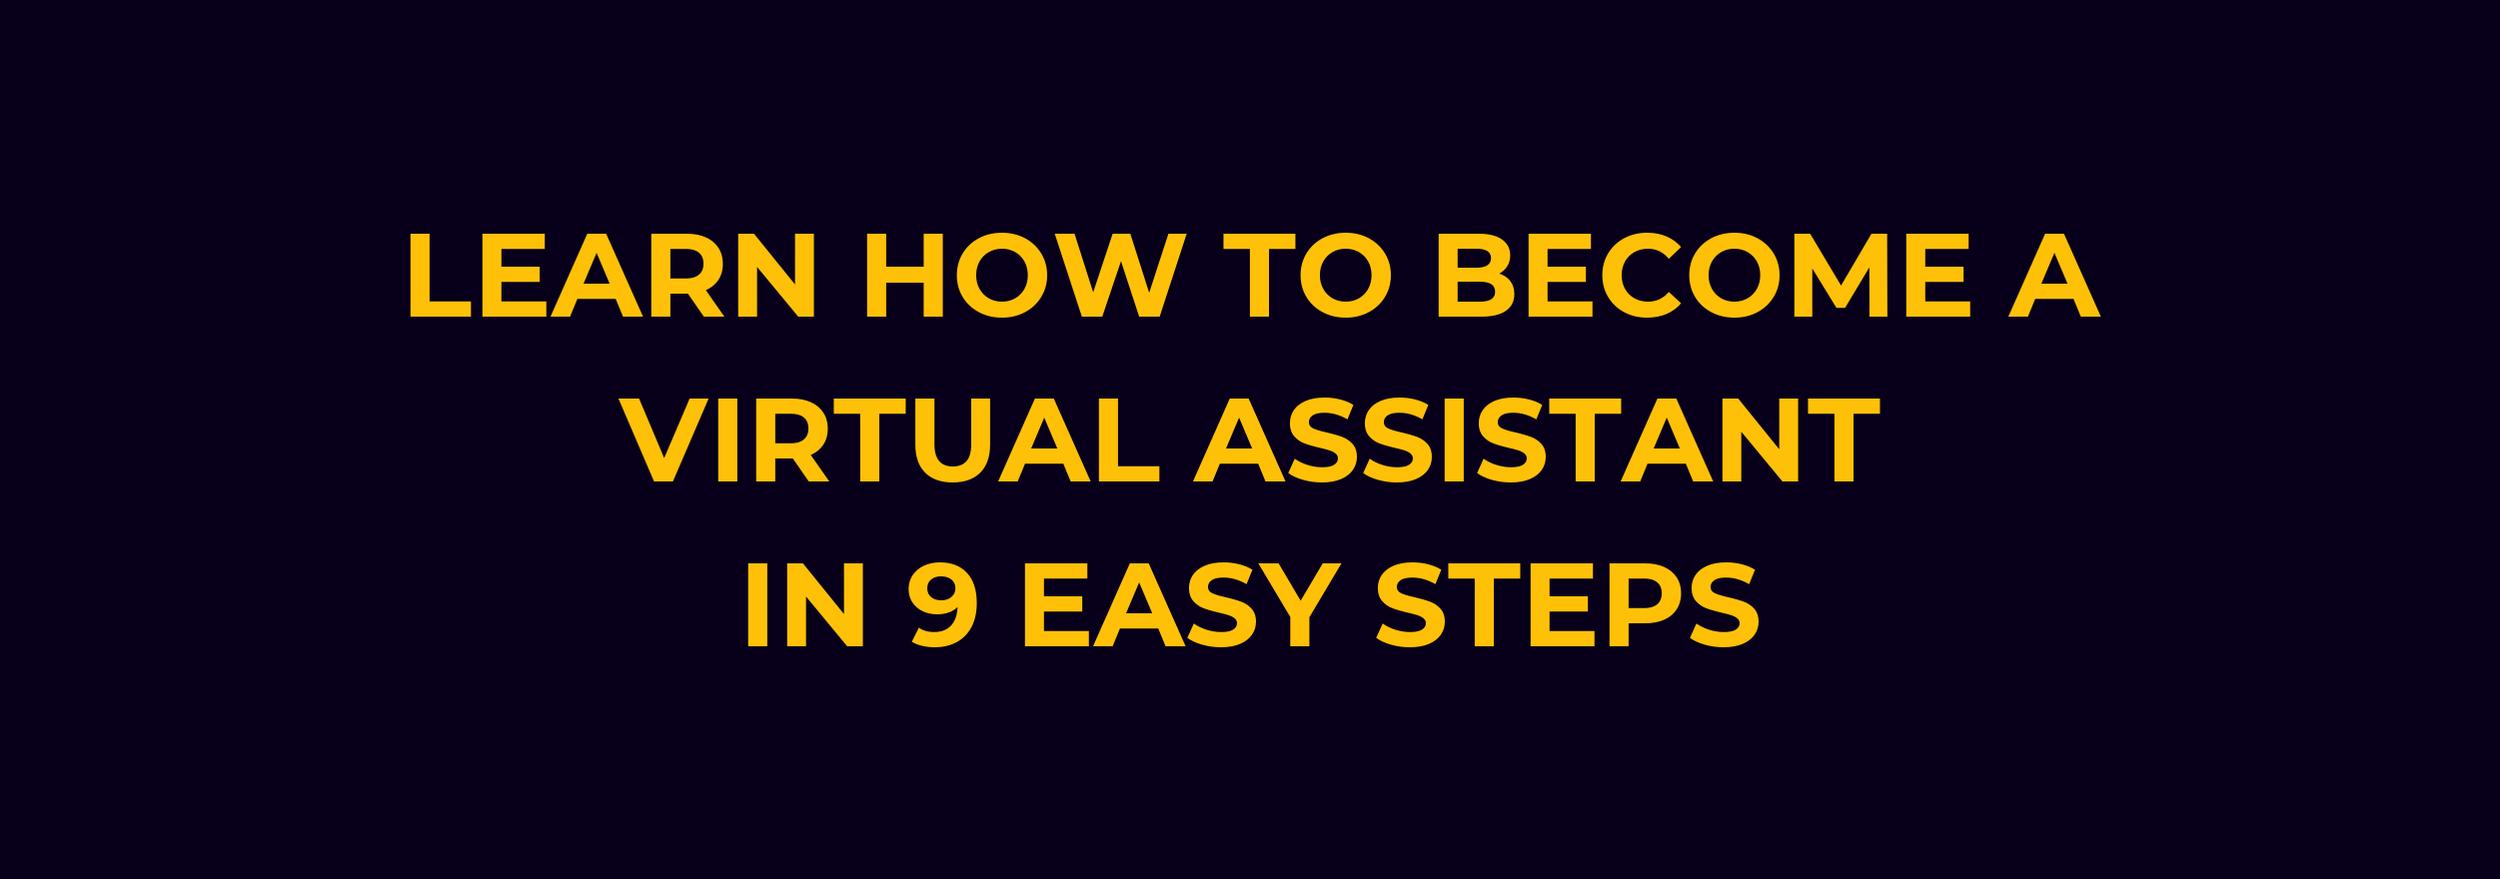 virtual assistant course